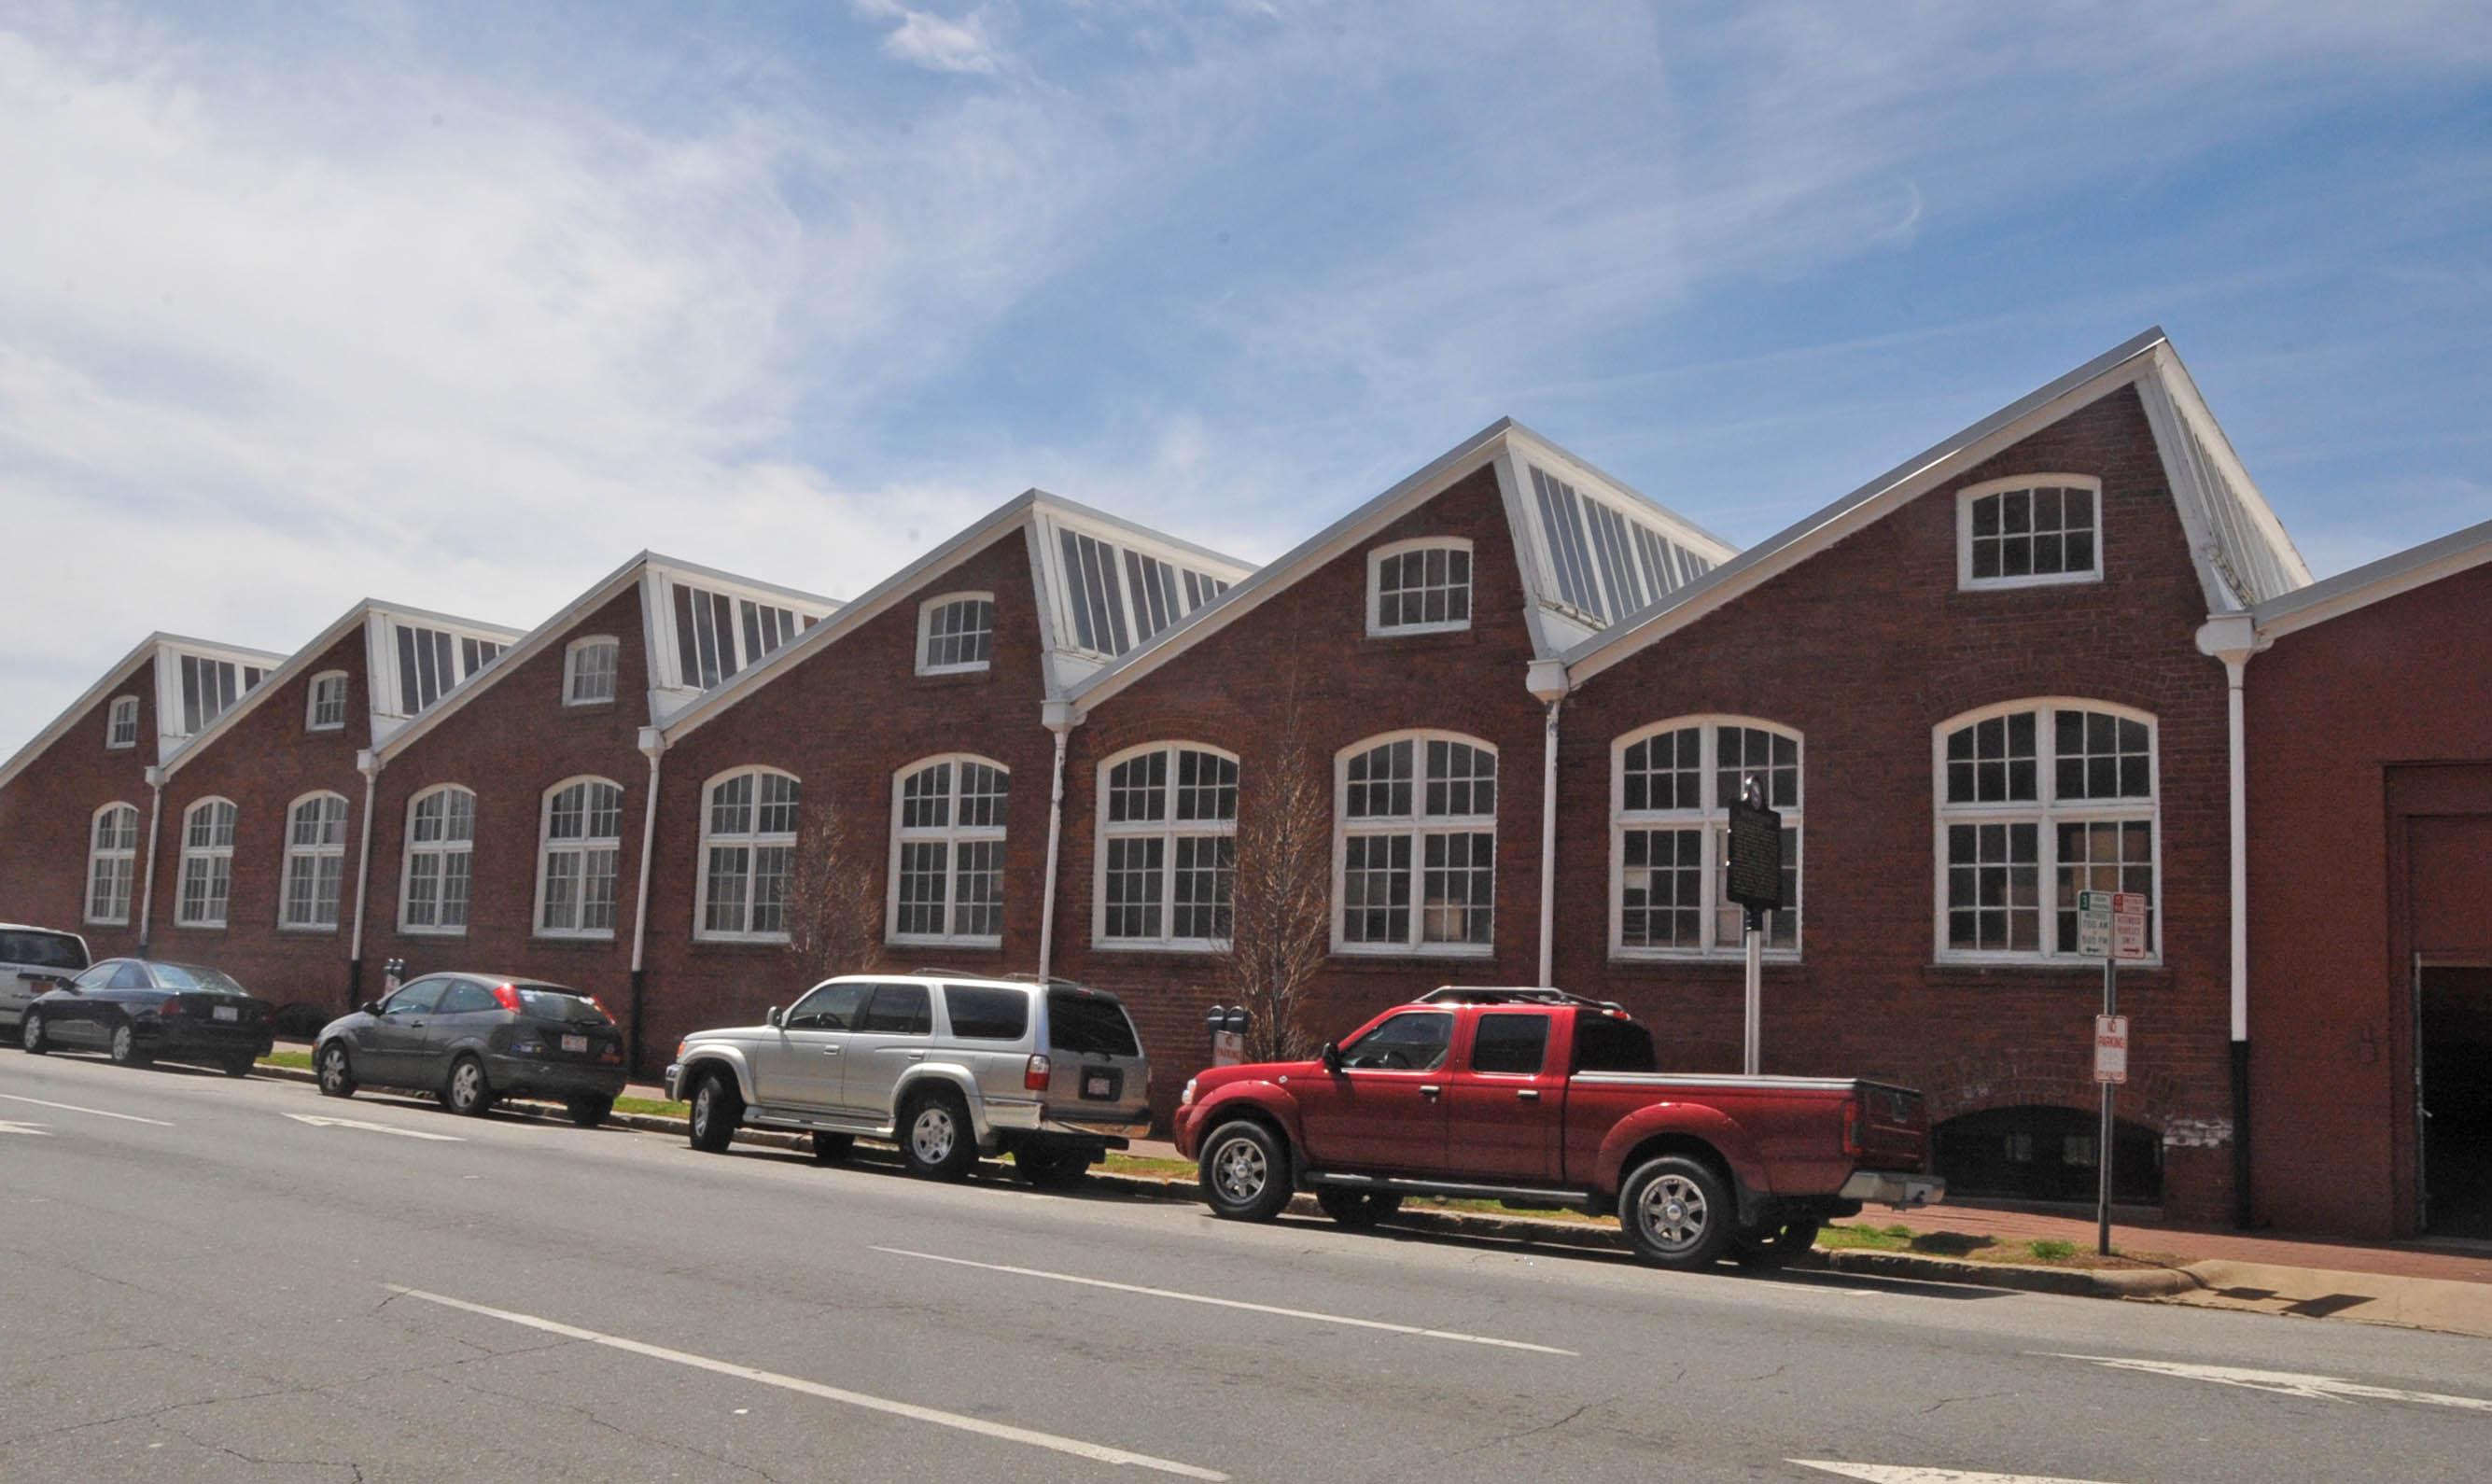 Forsyth County Nc Property Tax Break For Seniors